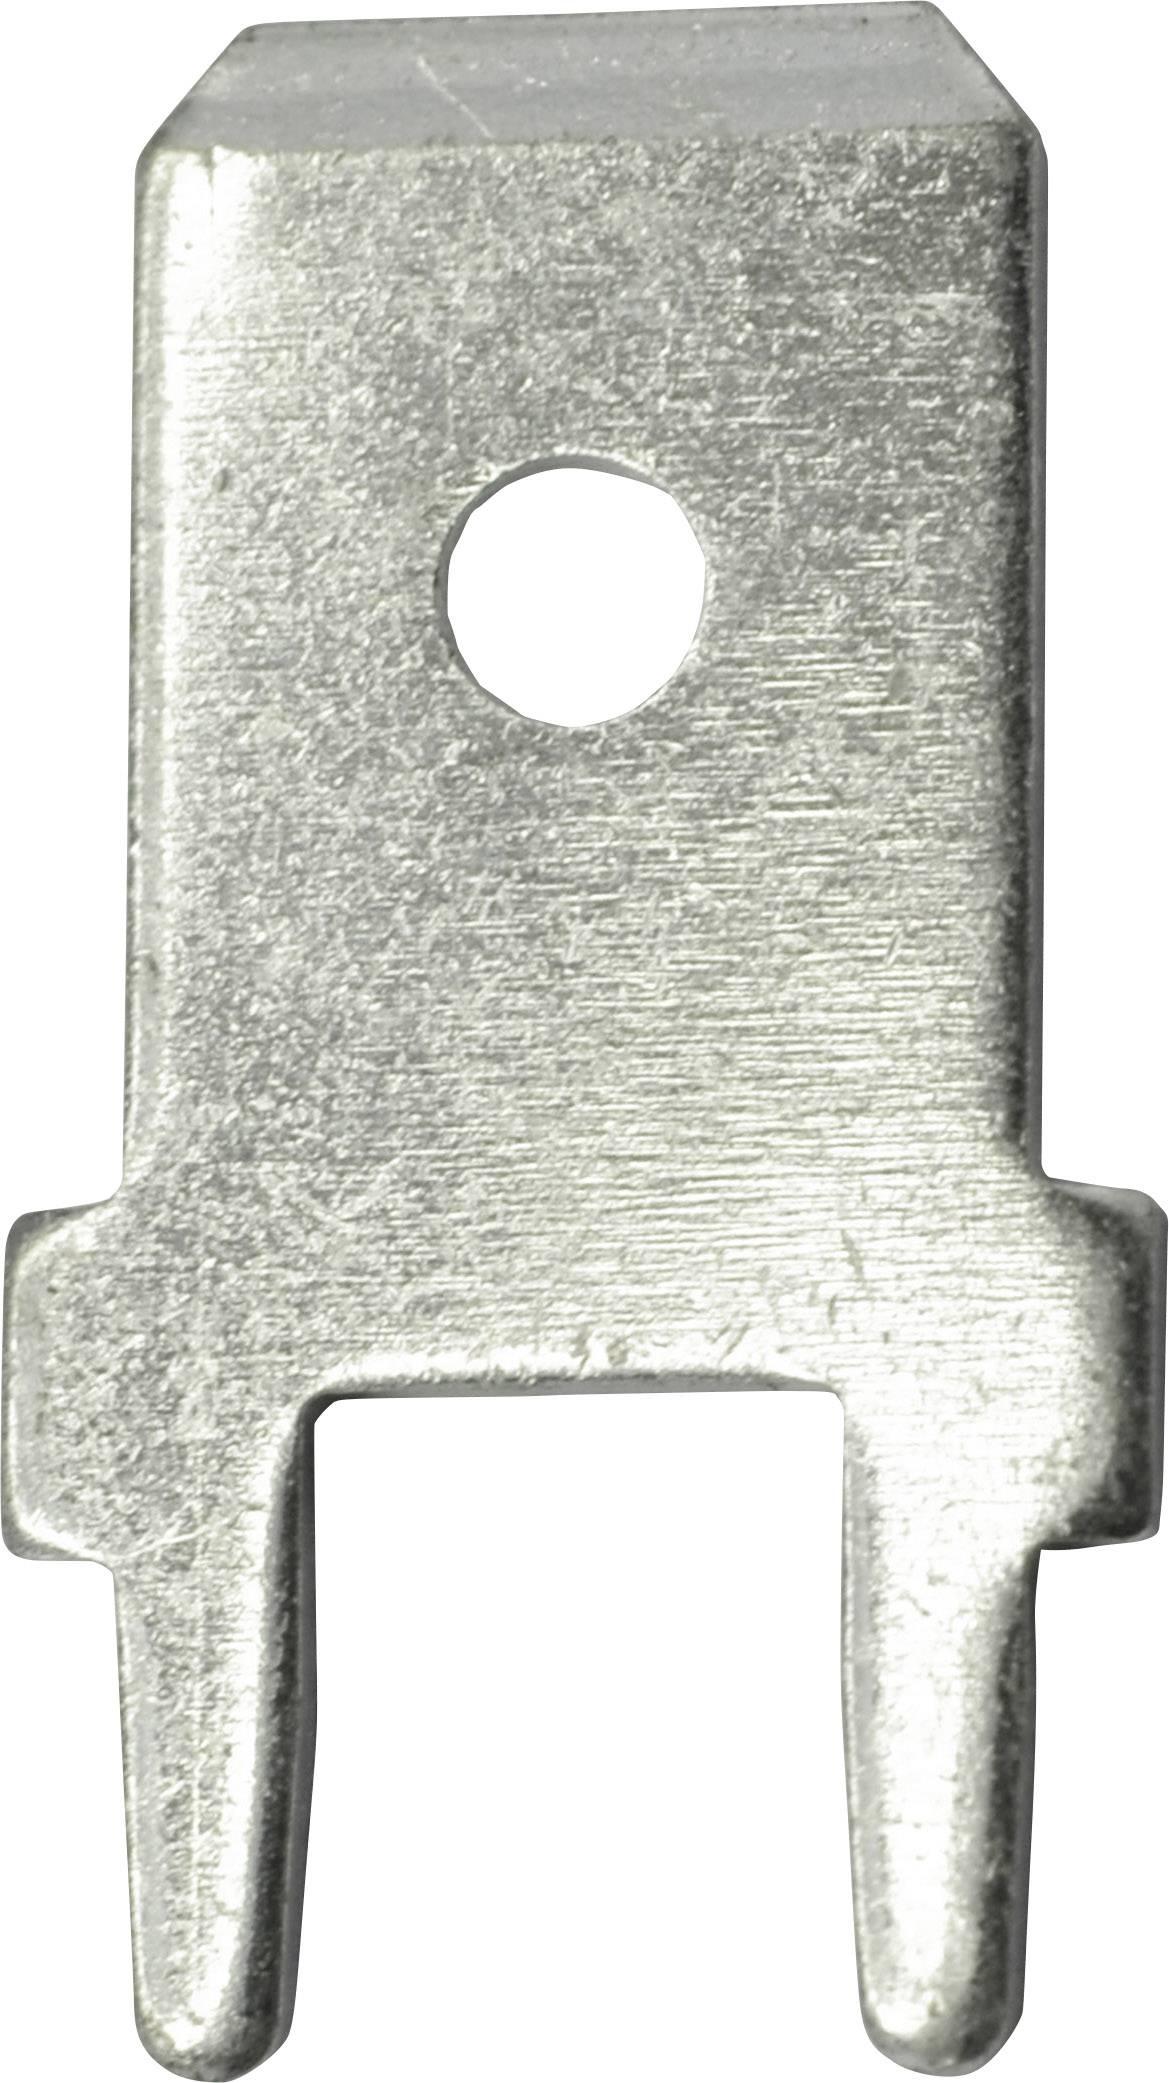 Faston zástrčka Vogt Verbindungstechnik 3866b.61 6.3 mm x 180 °, bez izolace, kov, 100 ks